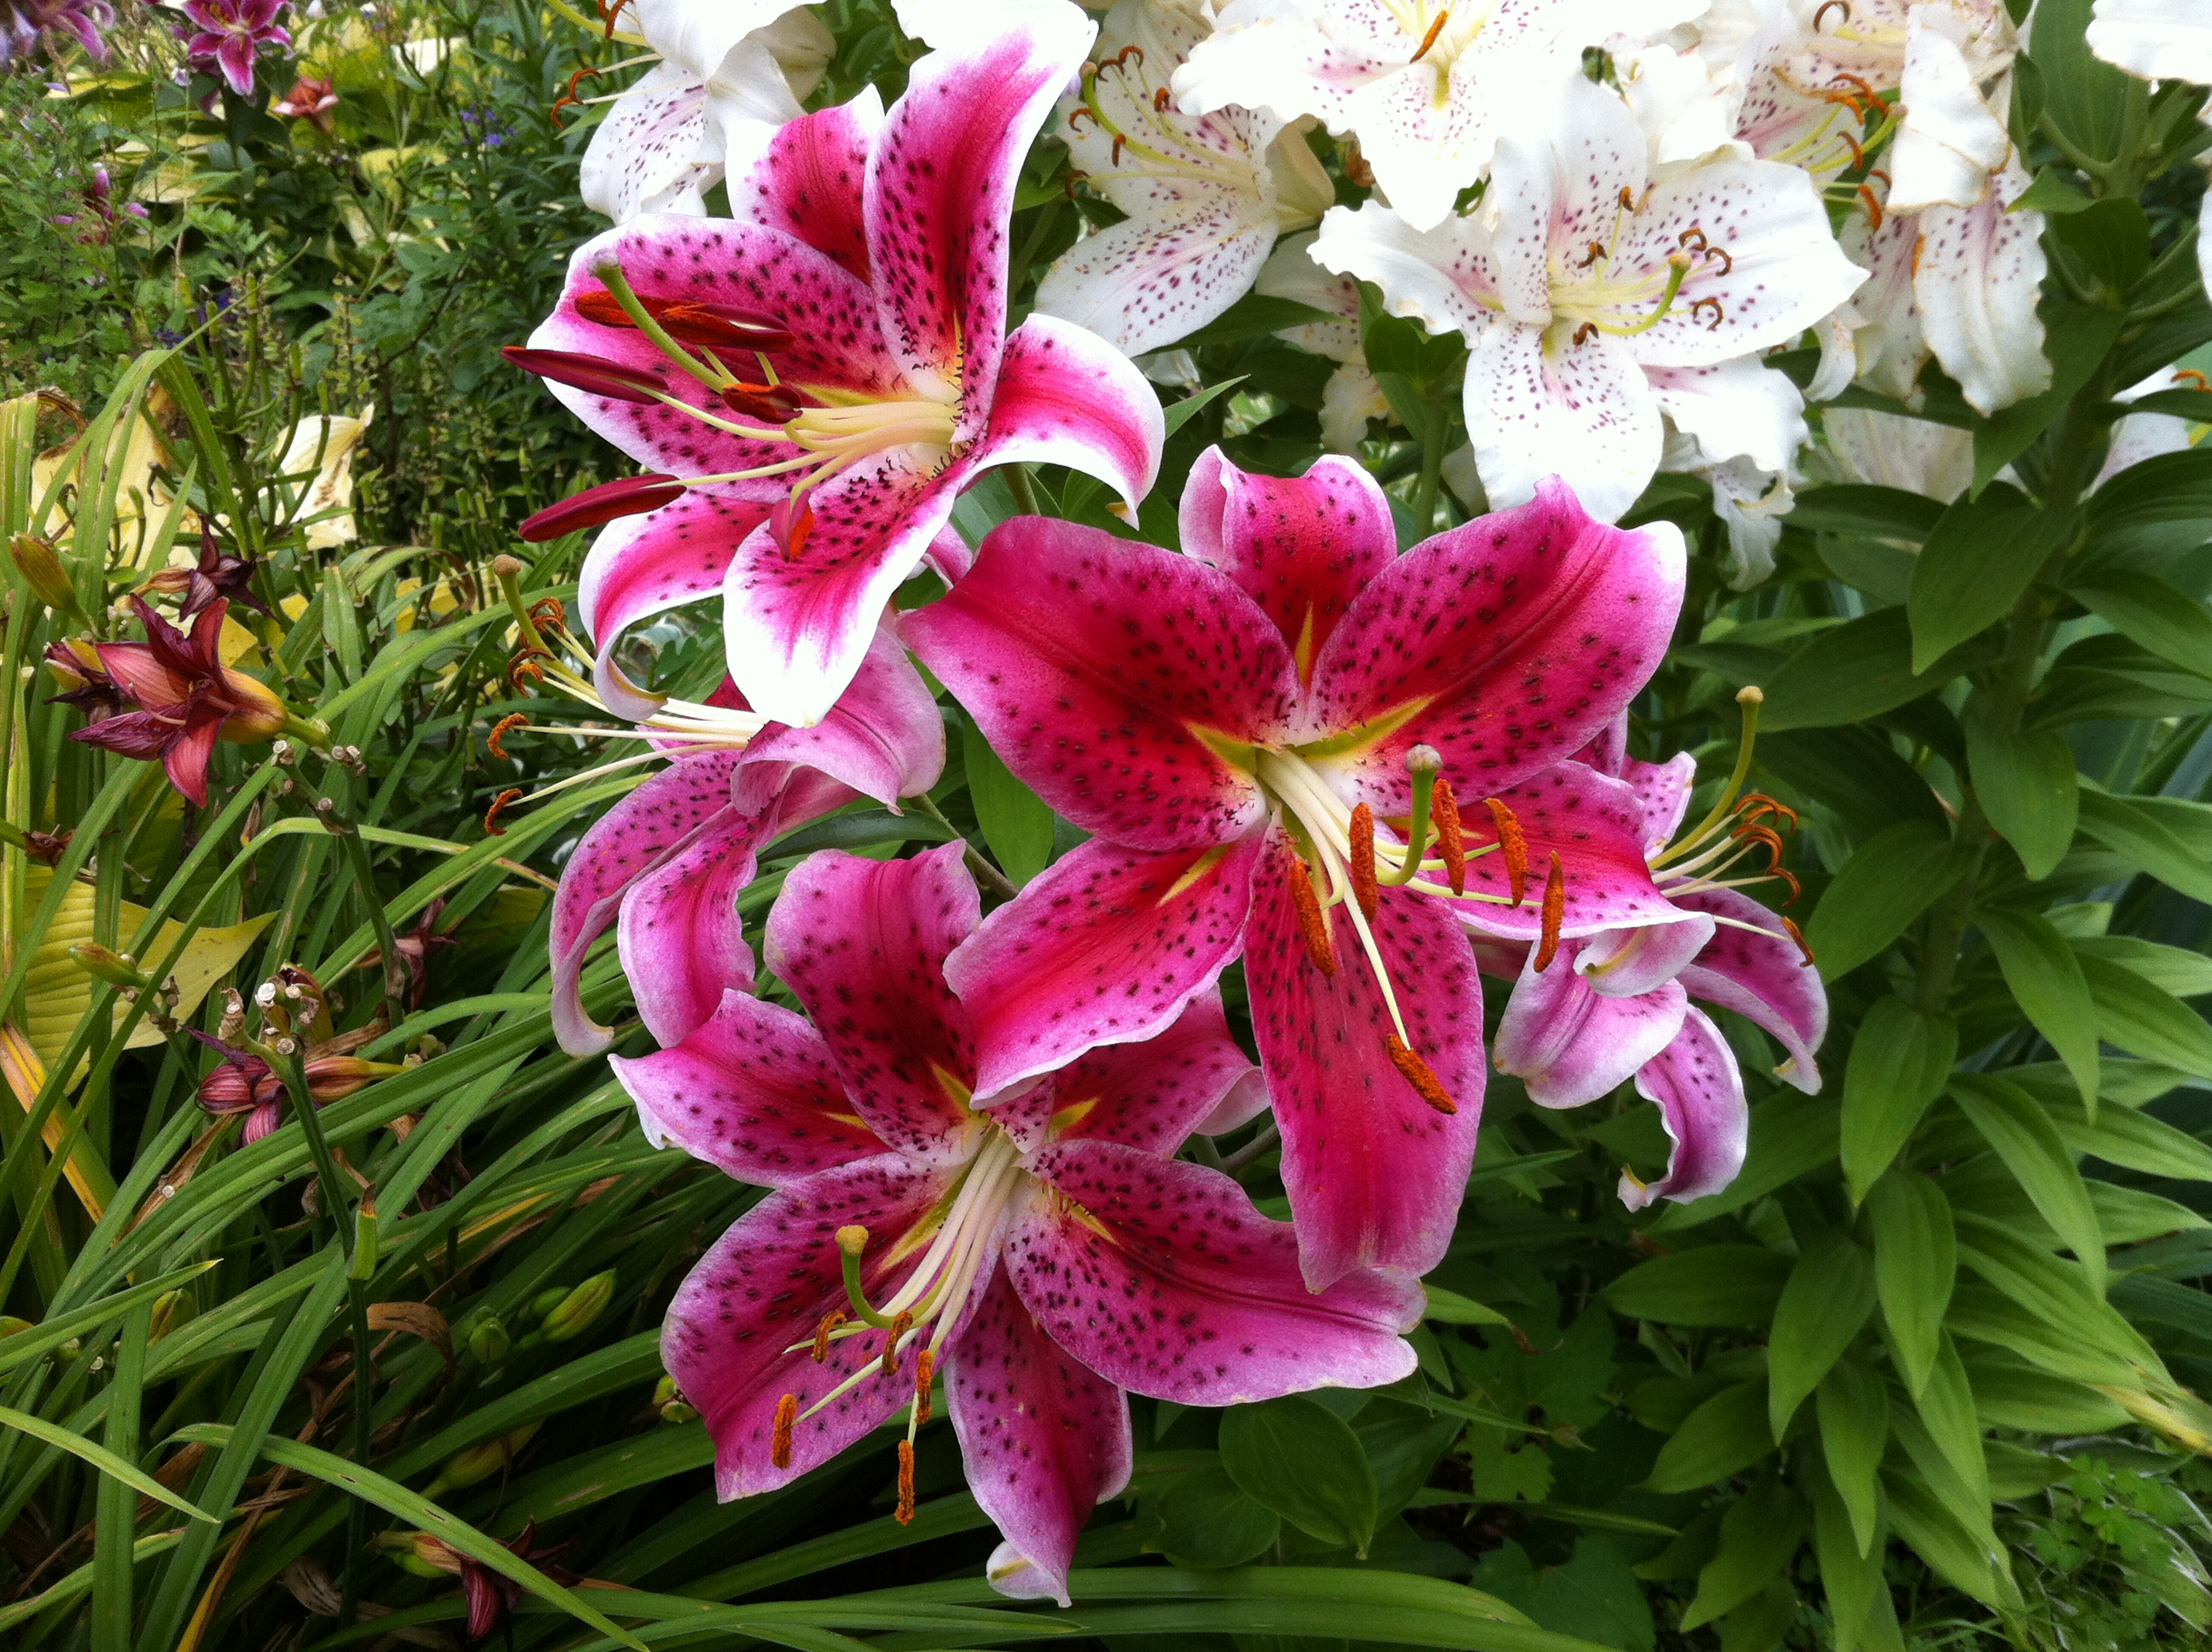 The Wonderful Hardy Lilies